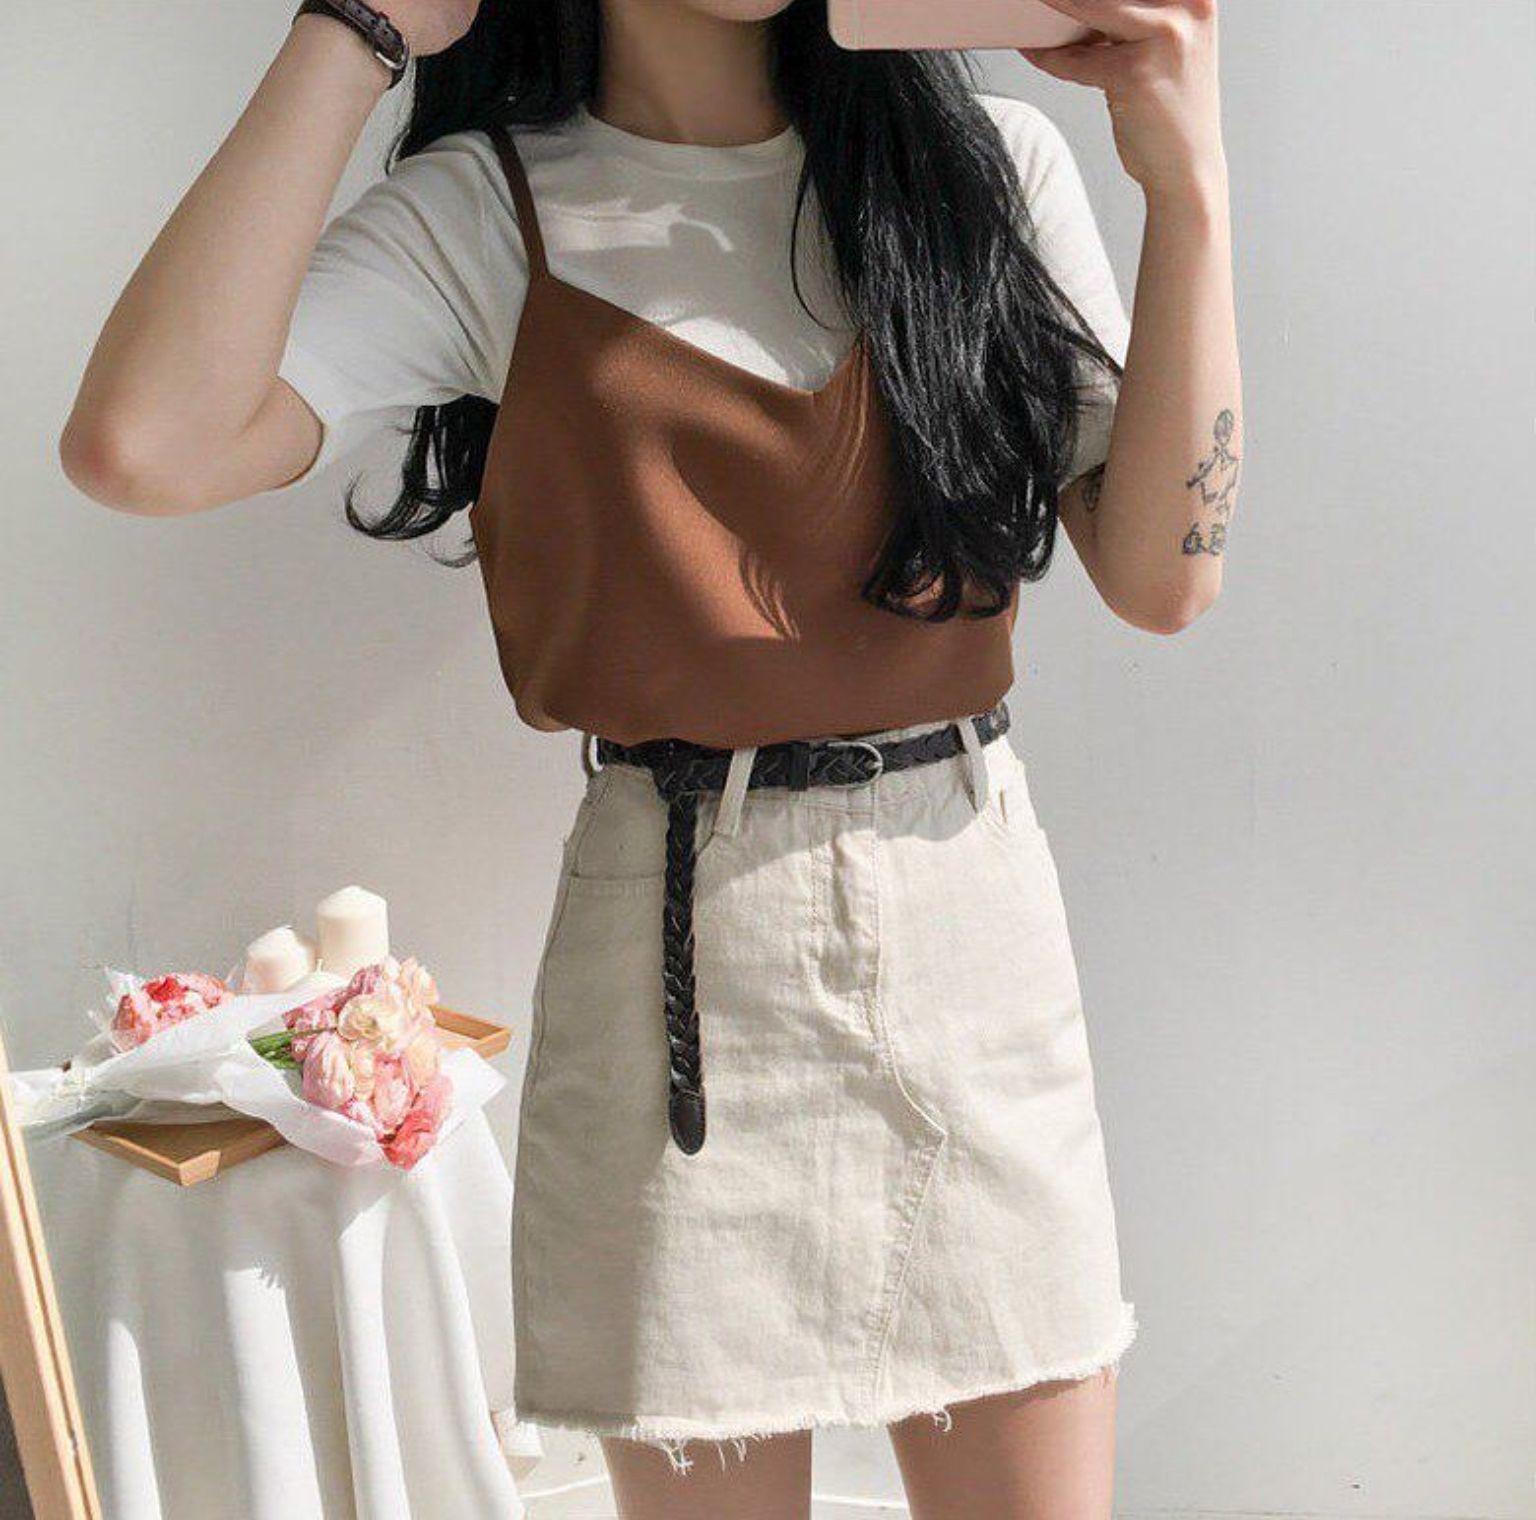 R O S I E In 2020 Ulzzang Fashion Fashion Inspo Outfits Korean Girl Fashion